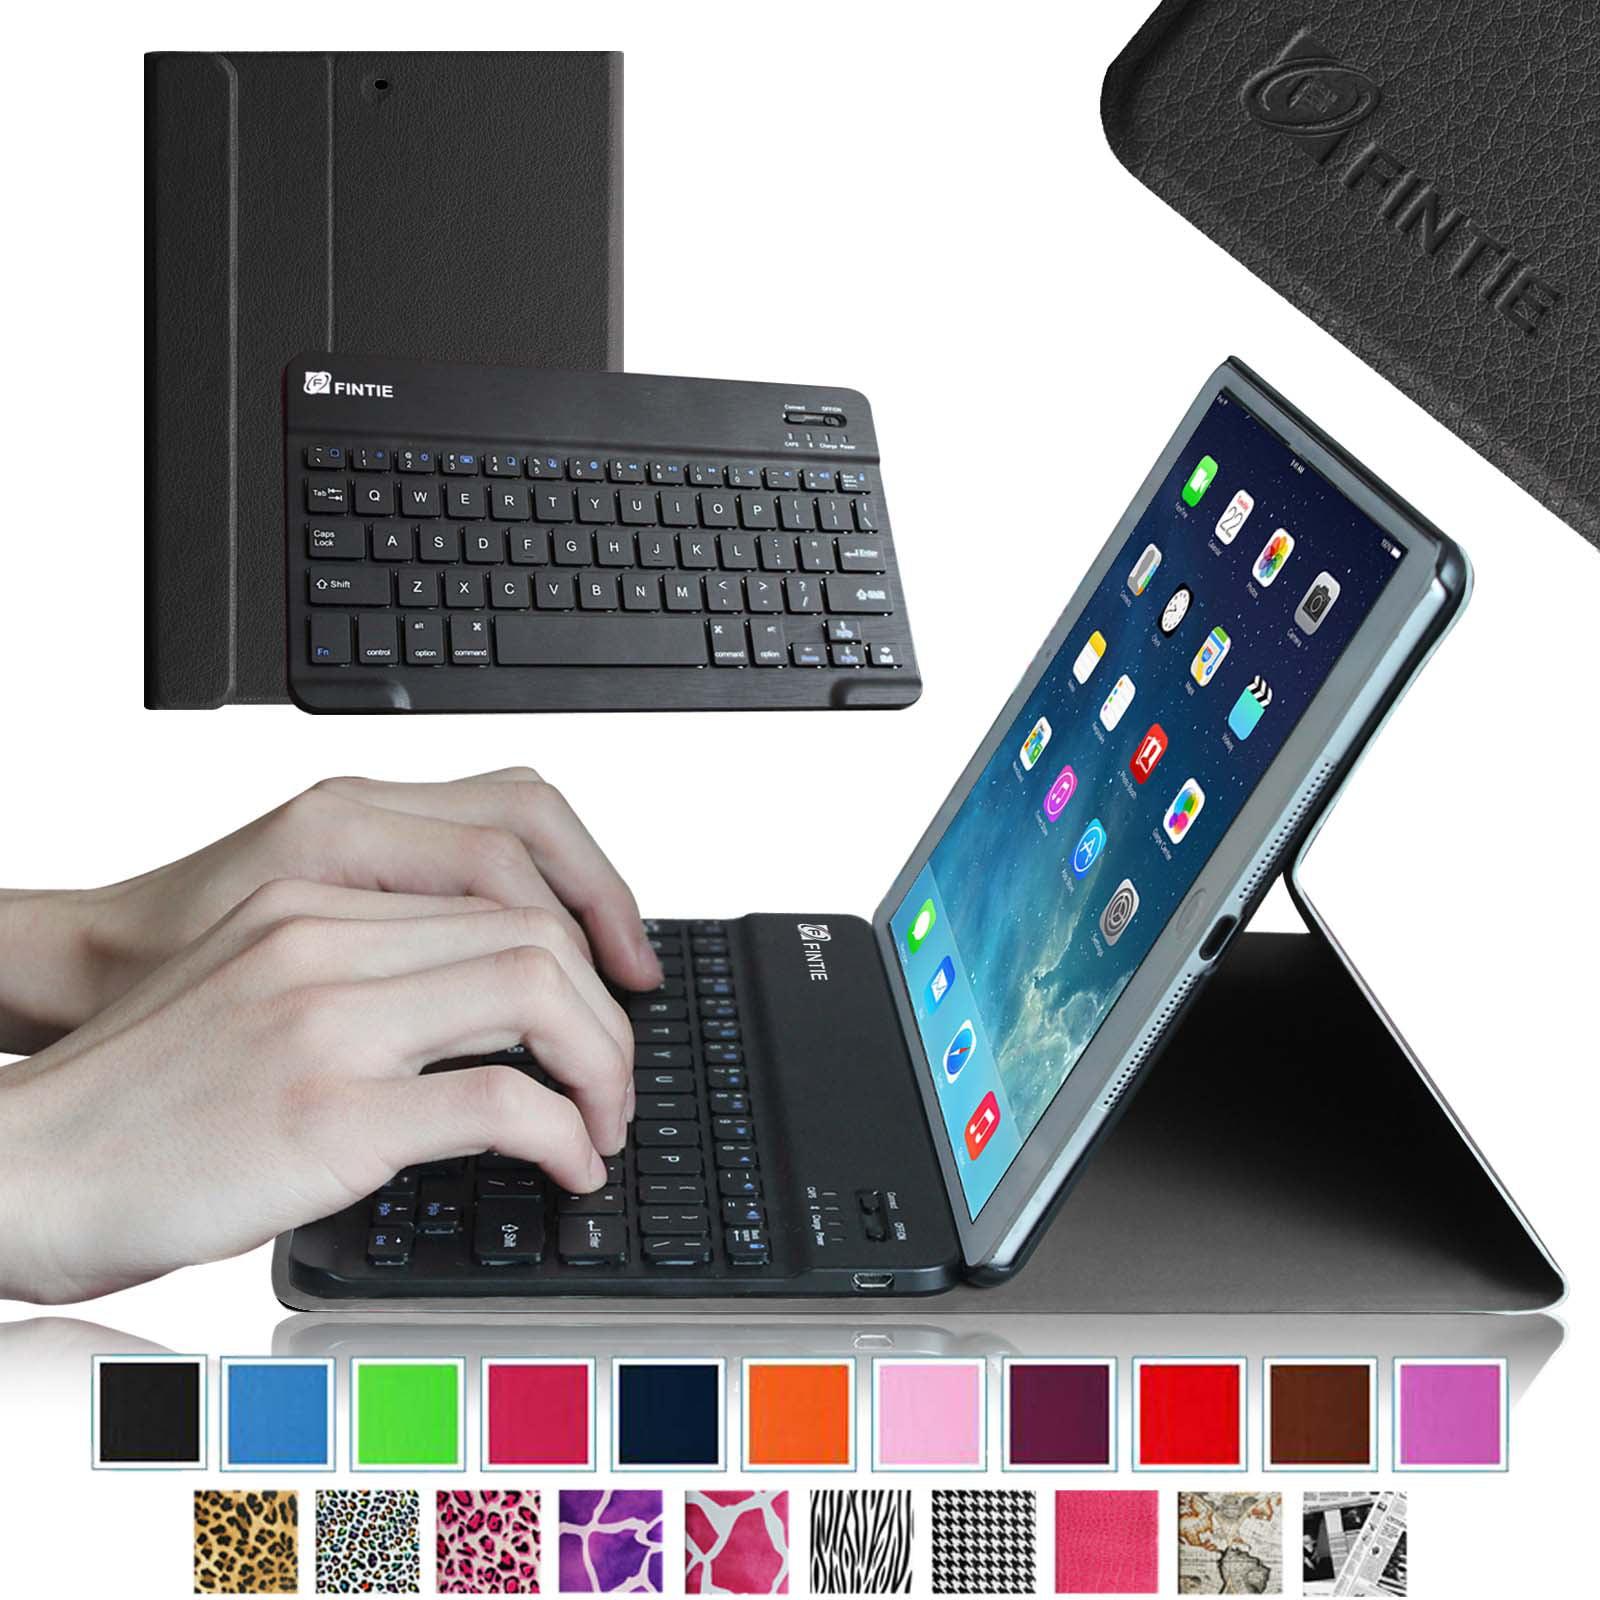 iPad mini 3 / iPad mini 2 / iPad mini Keyboard Case - Fintie Slim Shell Cover with Removable Bluetooth Keyboard, Black